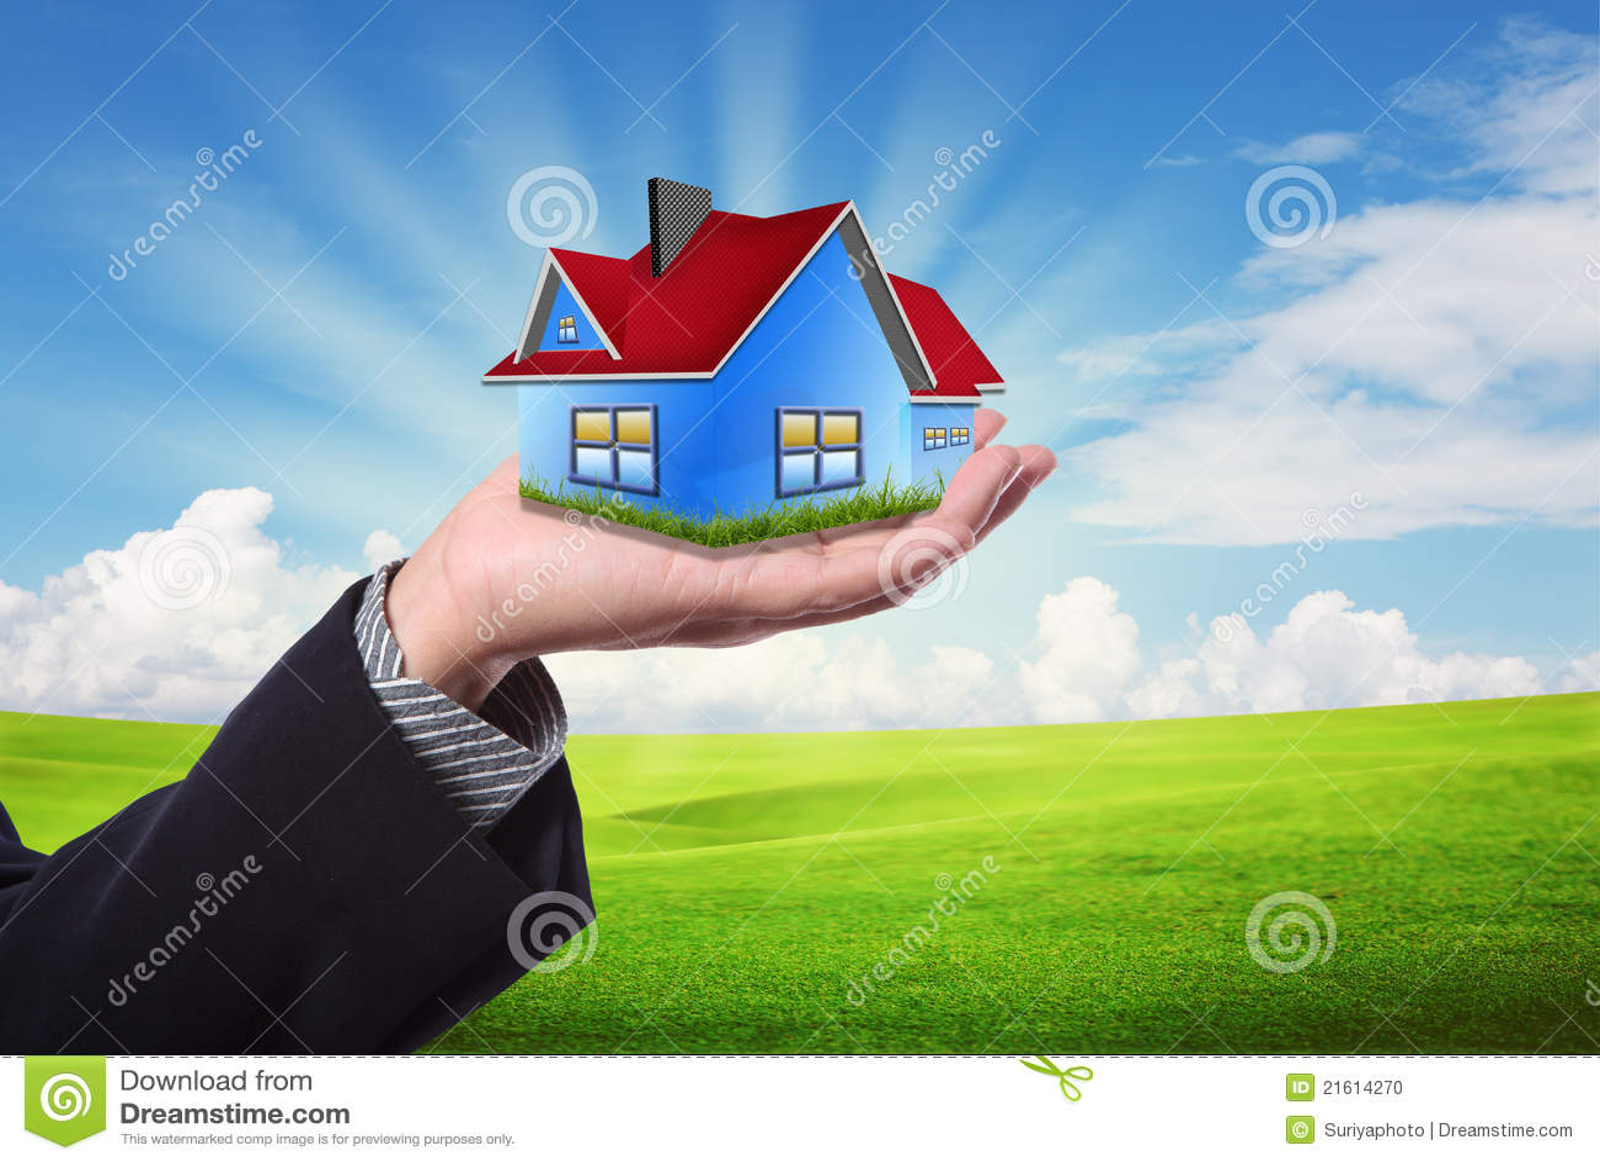 против голубого неба дома владением руки